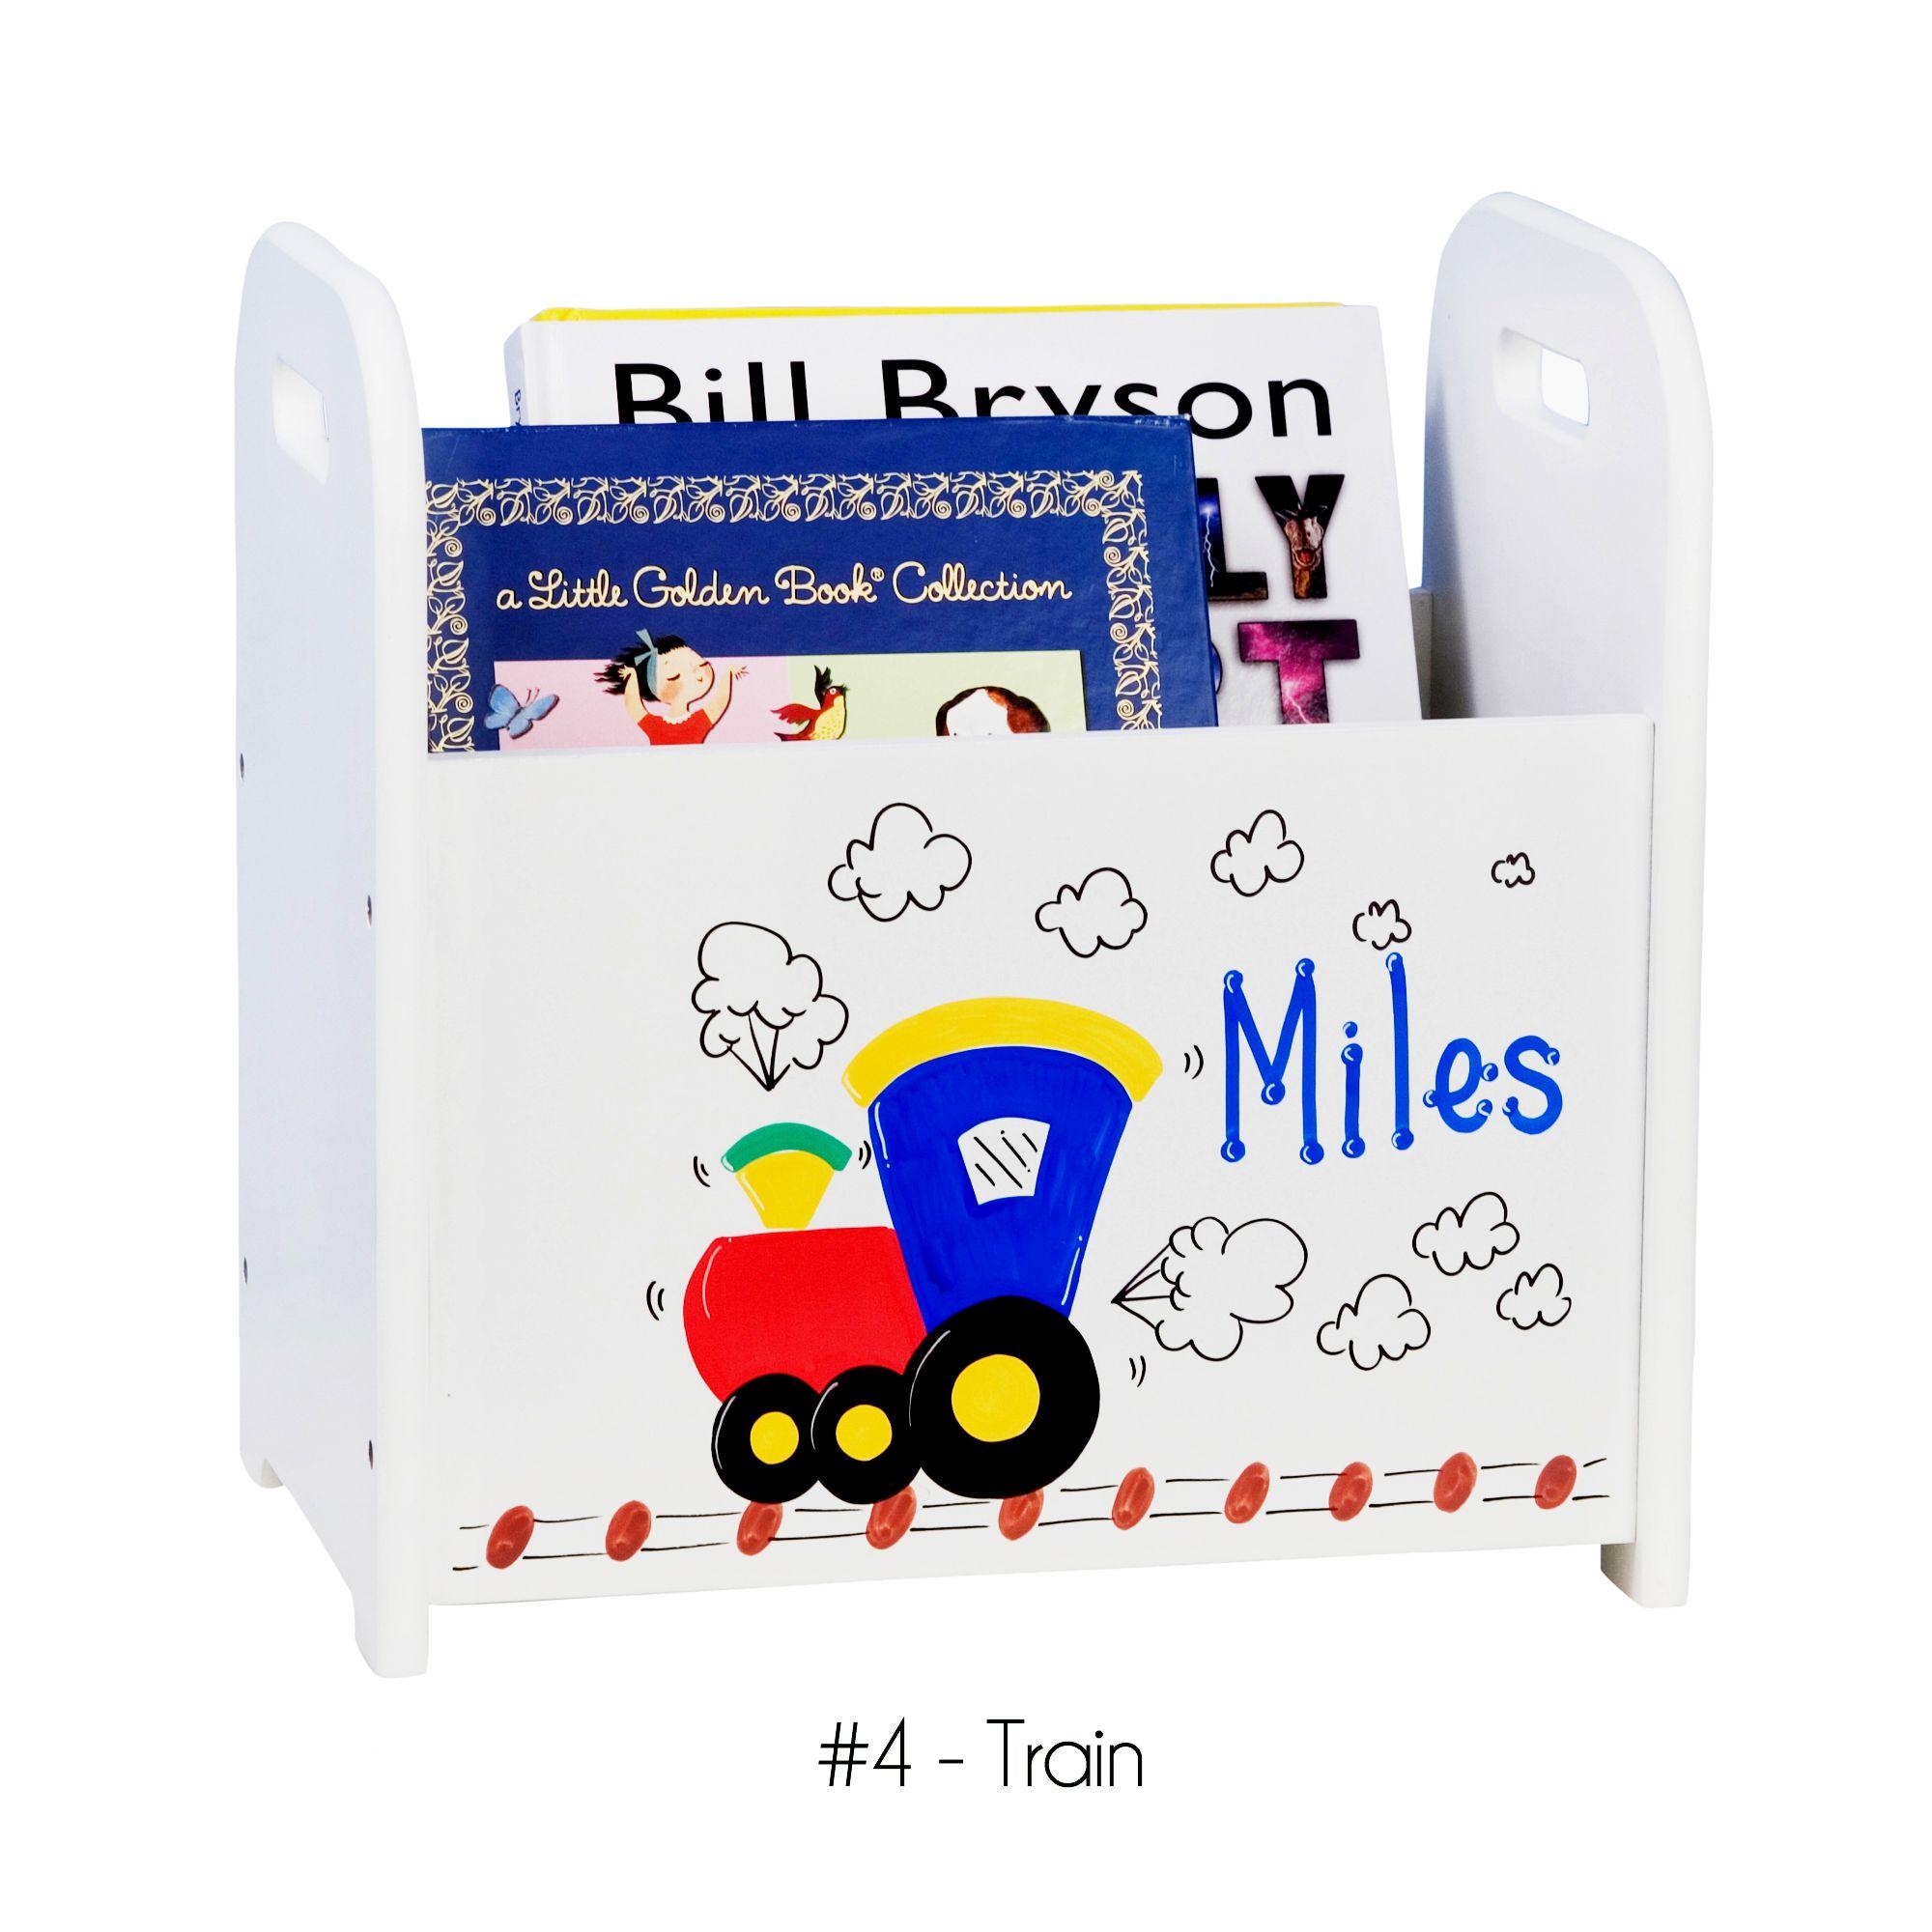 Cool Train Caddy Book Holder For Children Www Babyshower Ca Gifts